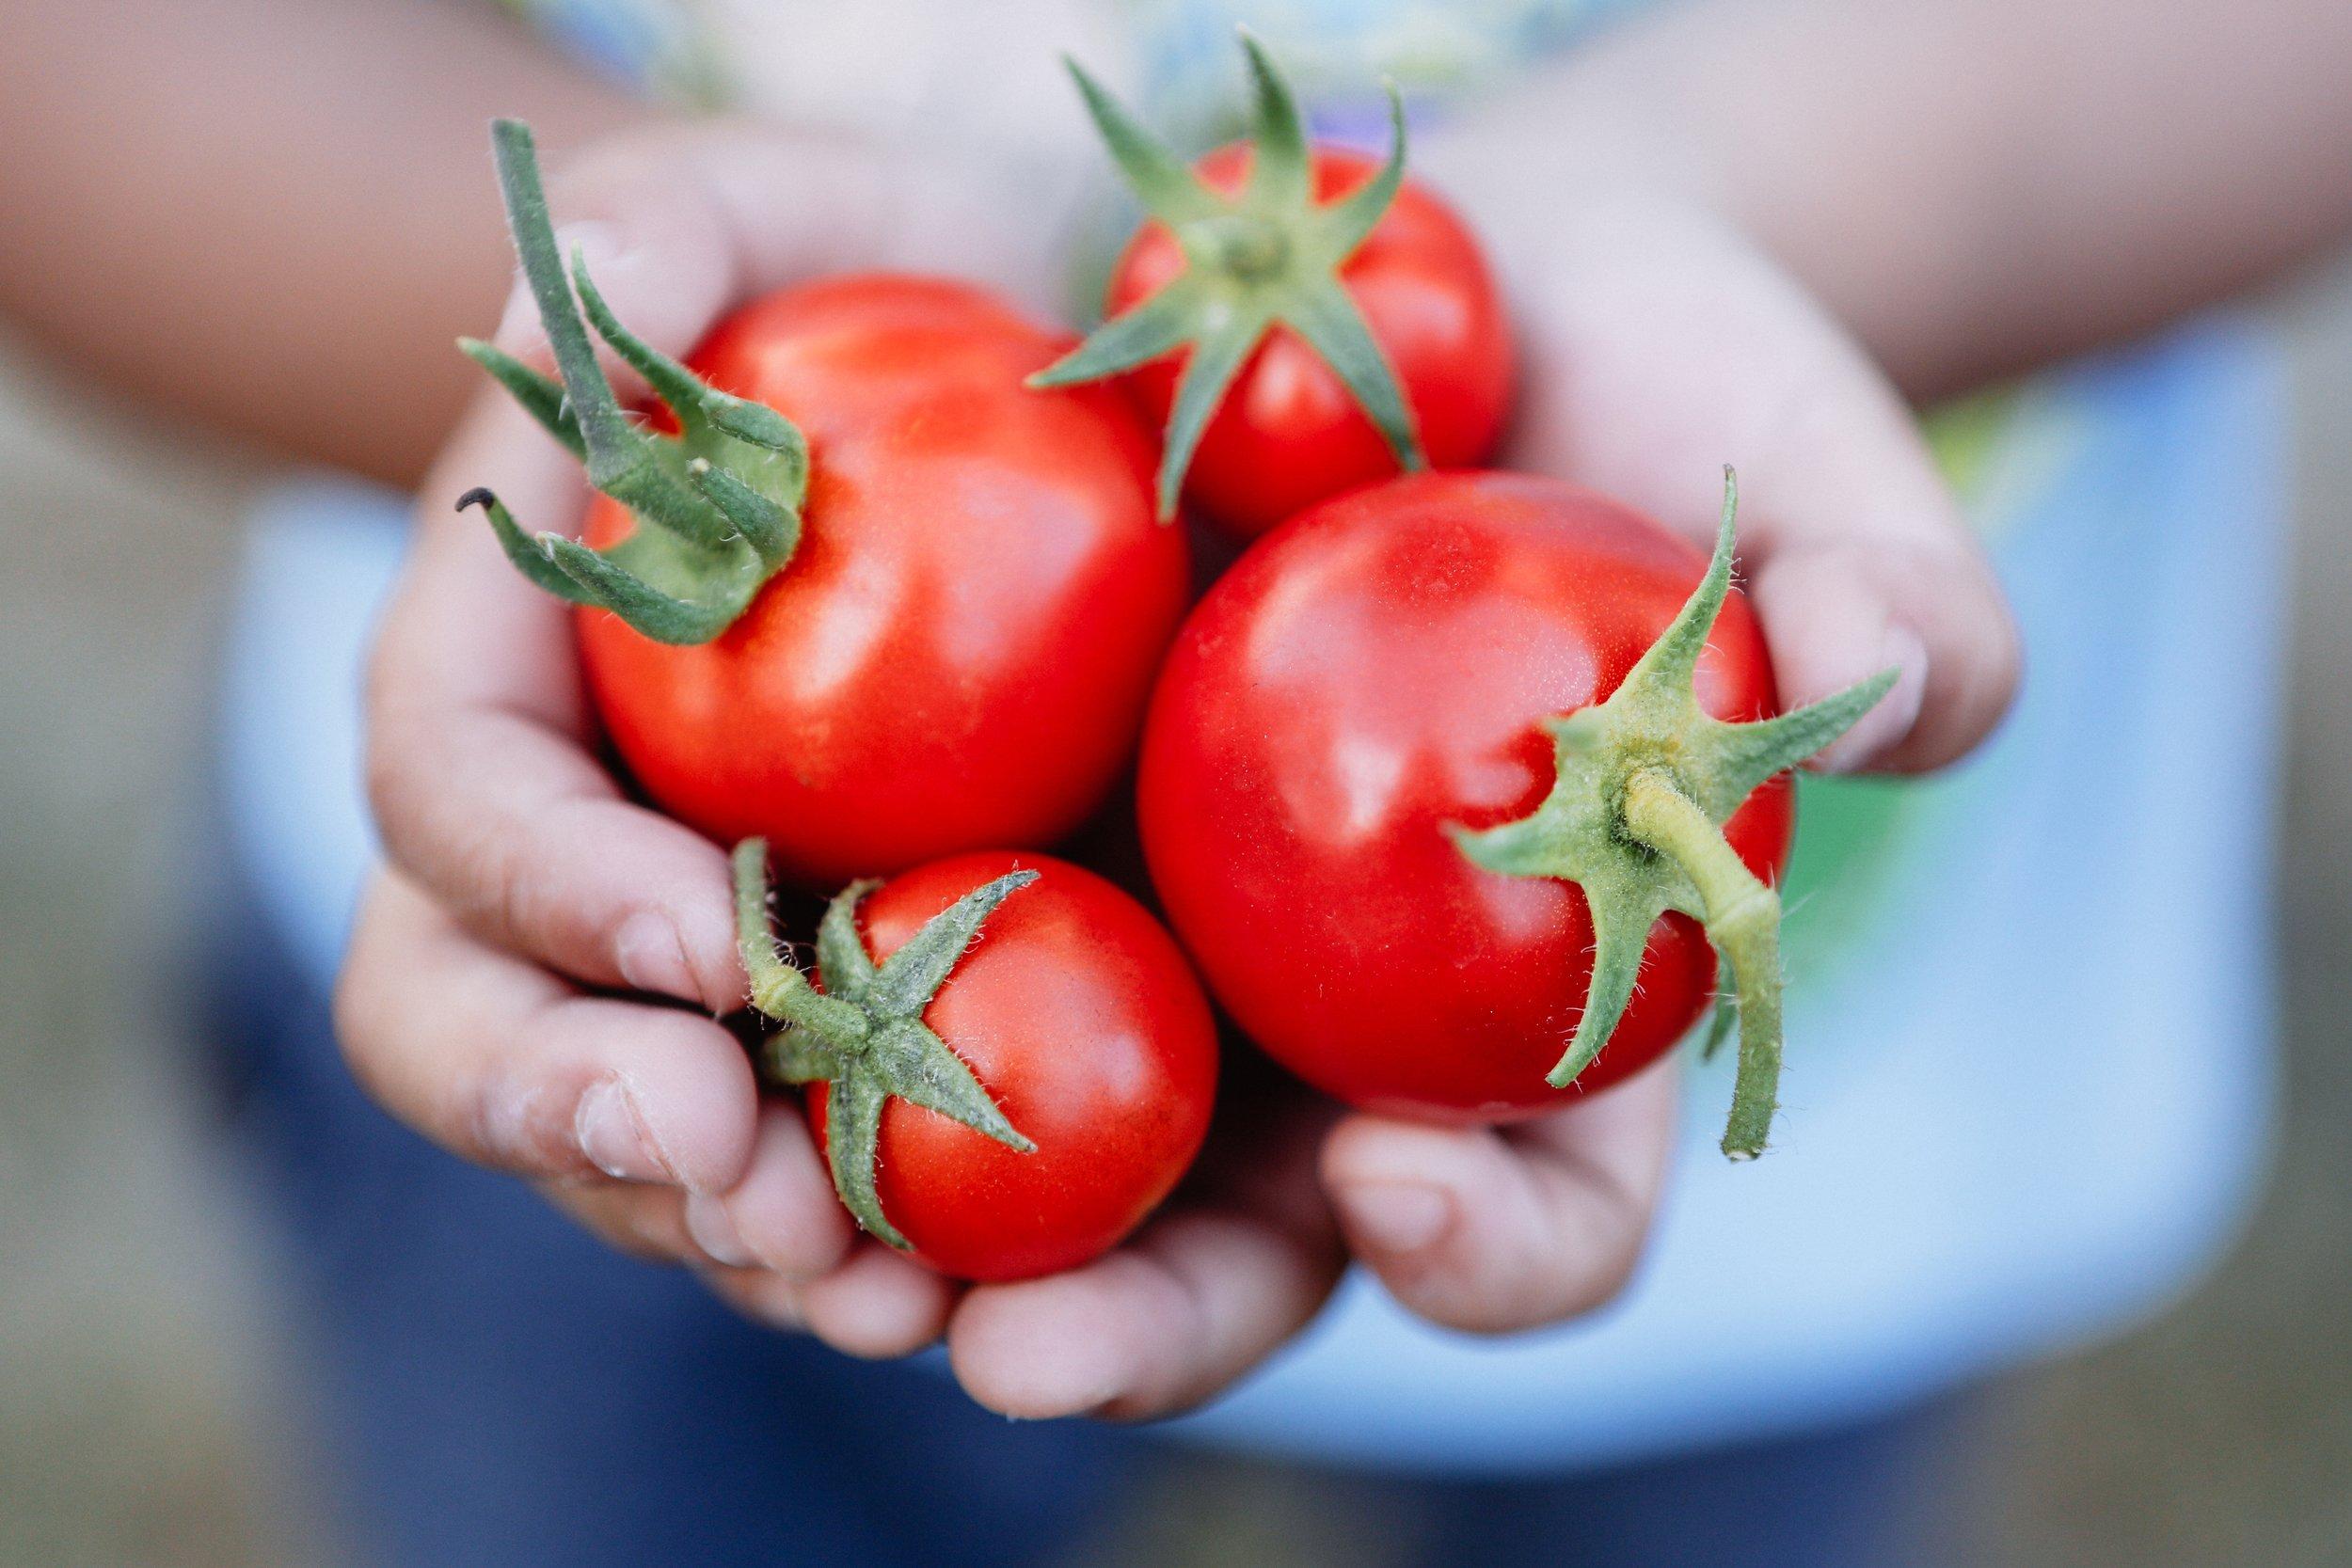 a-handful-of-ripe-sweet-organic-tomatoes-freshly-picked-from-a-home-garden_t20_JYKLKP.jpg